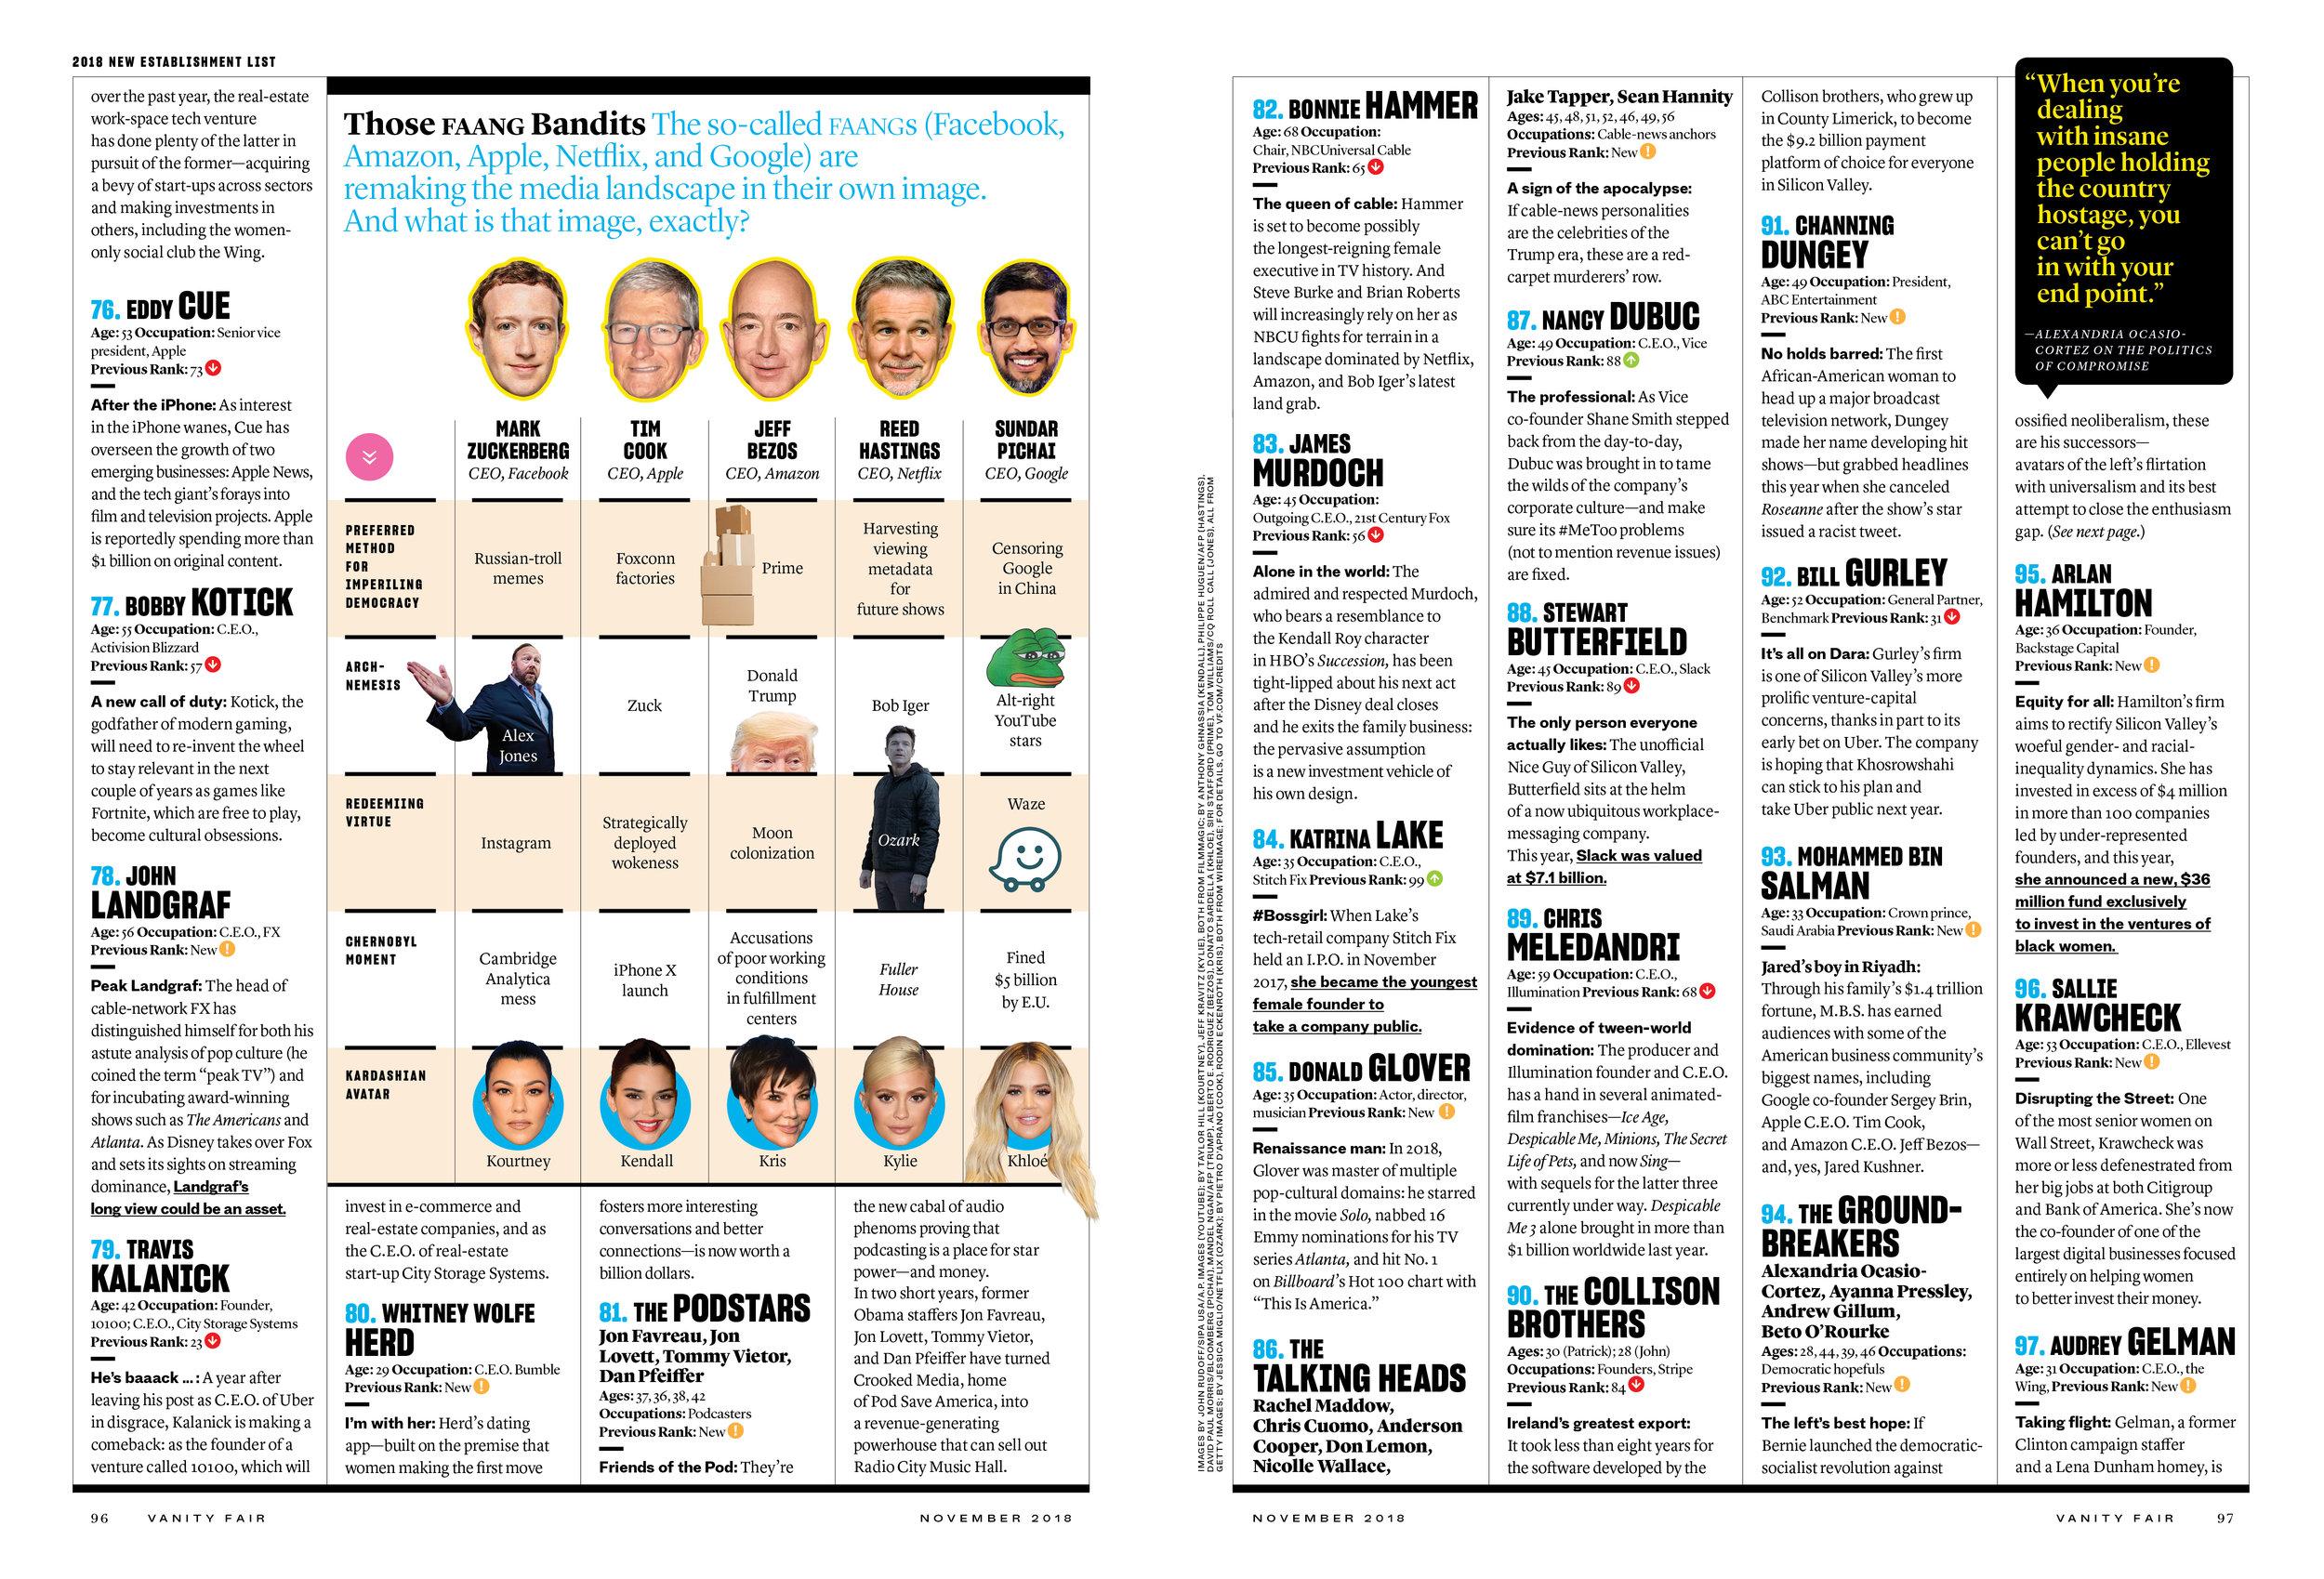 11 NEW ESTABLISHMENT lo PART 24.jpg